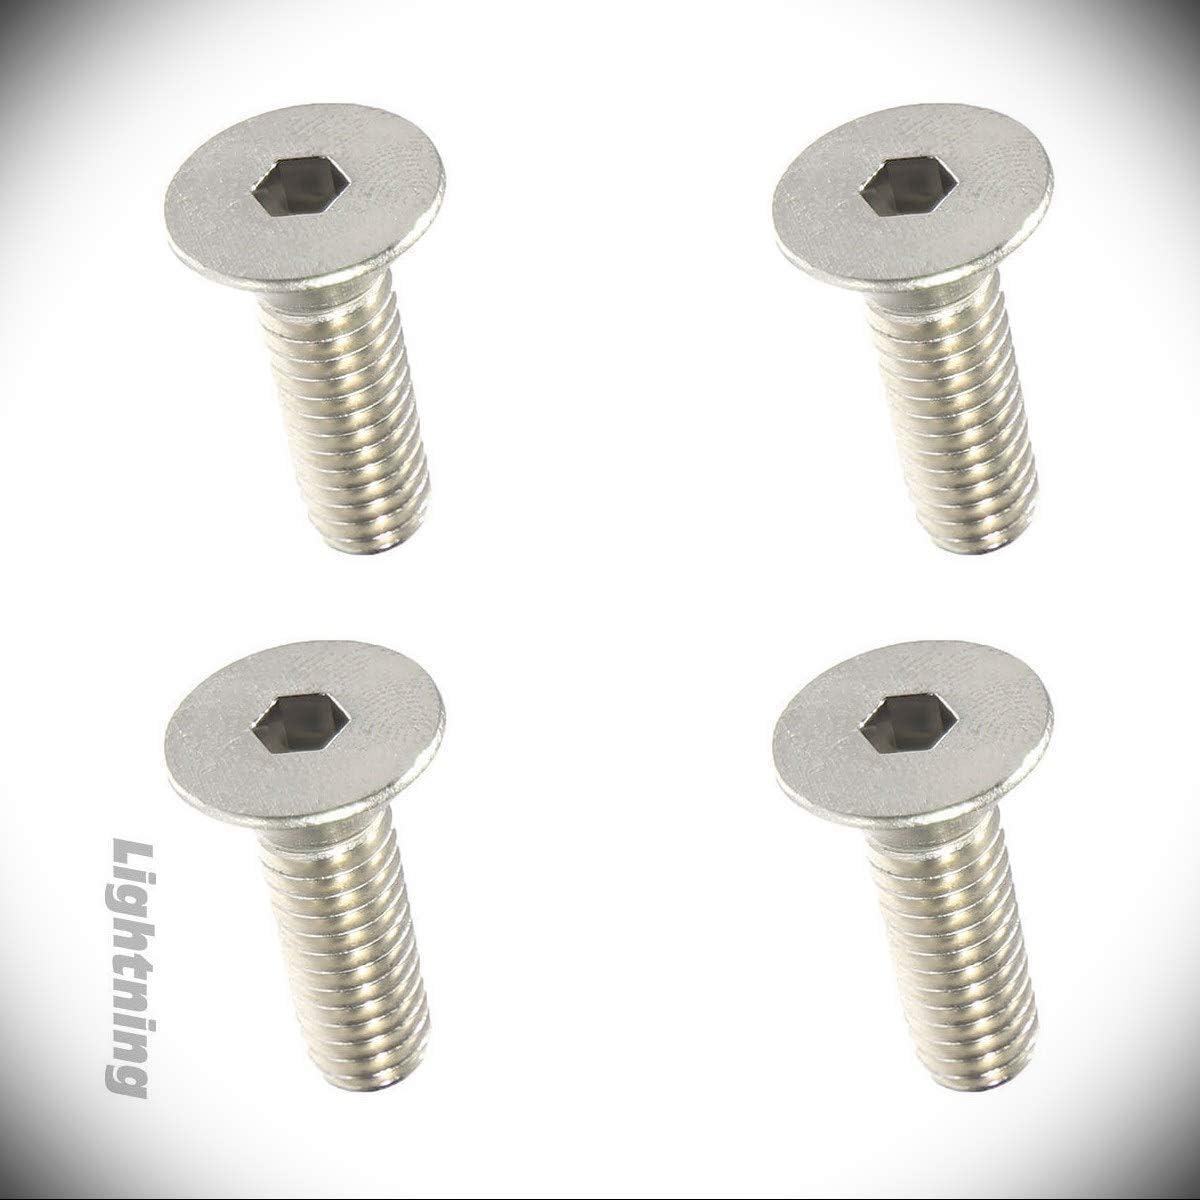 Metric Flat Head Socket Cap Screw Metric Hardware Fastener Kit A4 Stainless Steel M3 x 0.5 x 40mm Set of 100